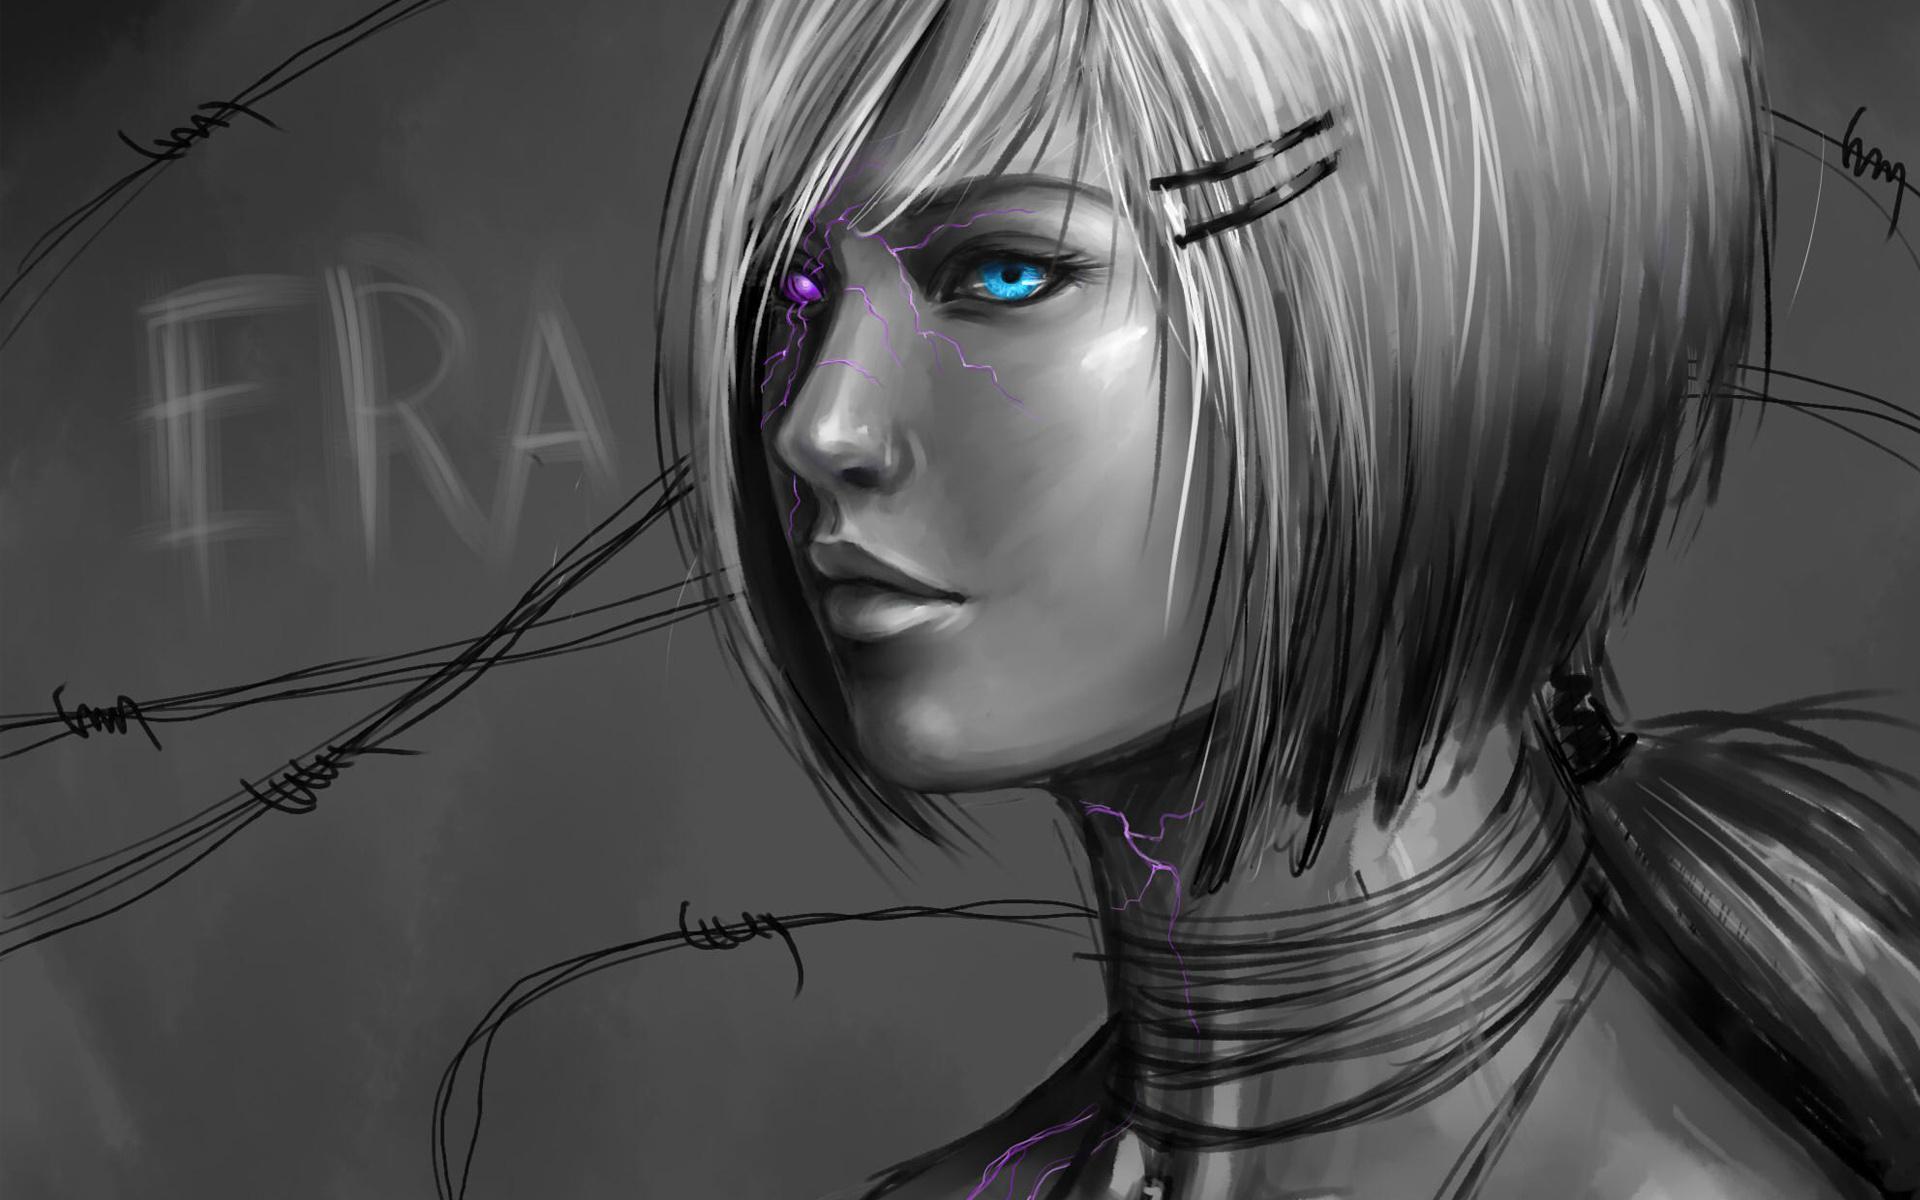 Tiger Cute Drawing Wallpaper Hd Drawing Rilun Girl Eyes Art Cyborg Hd Resolution